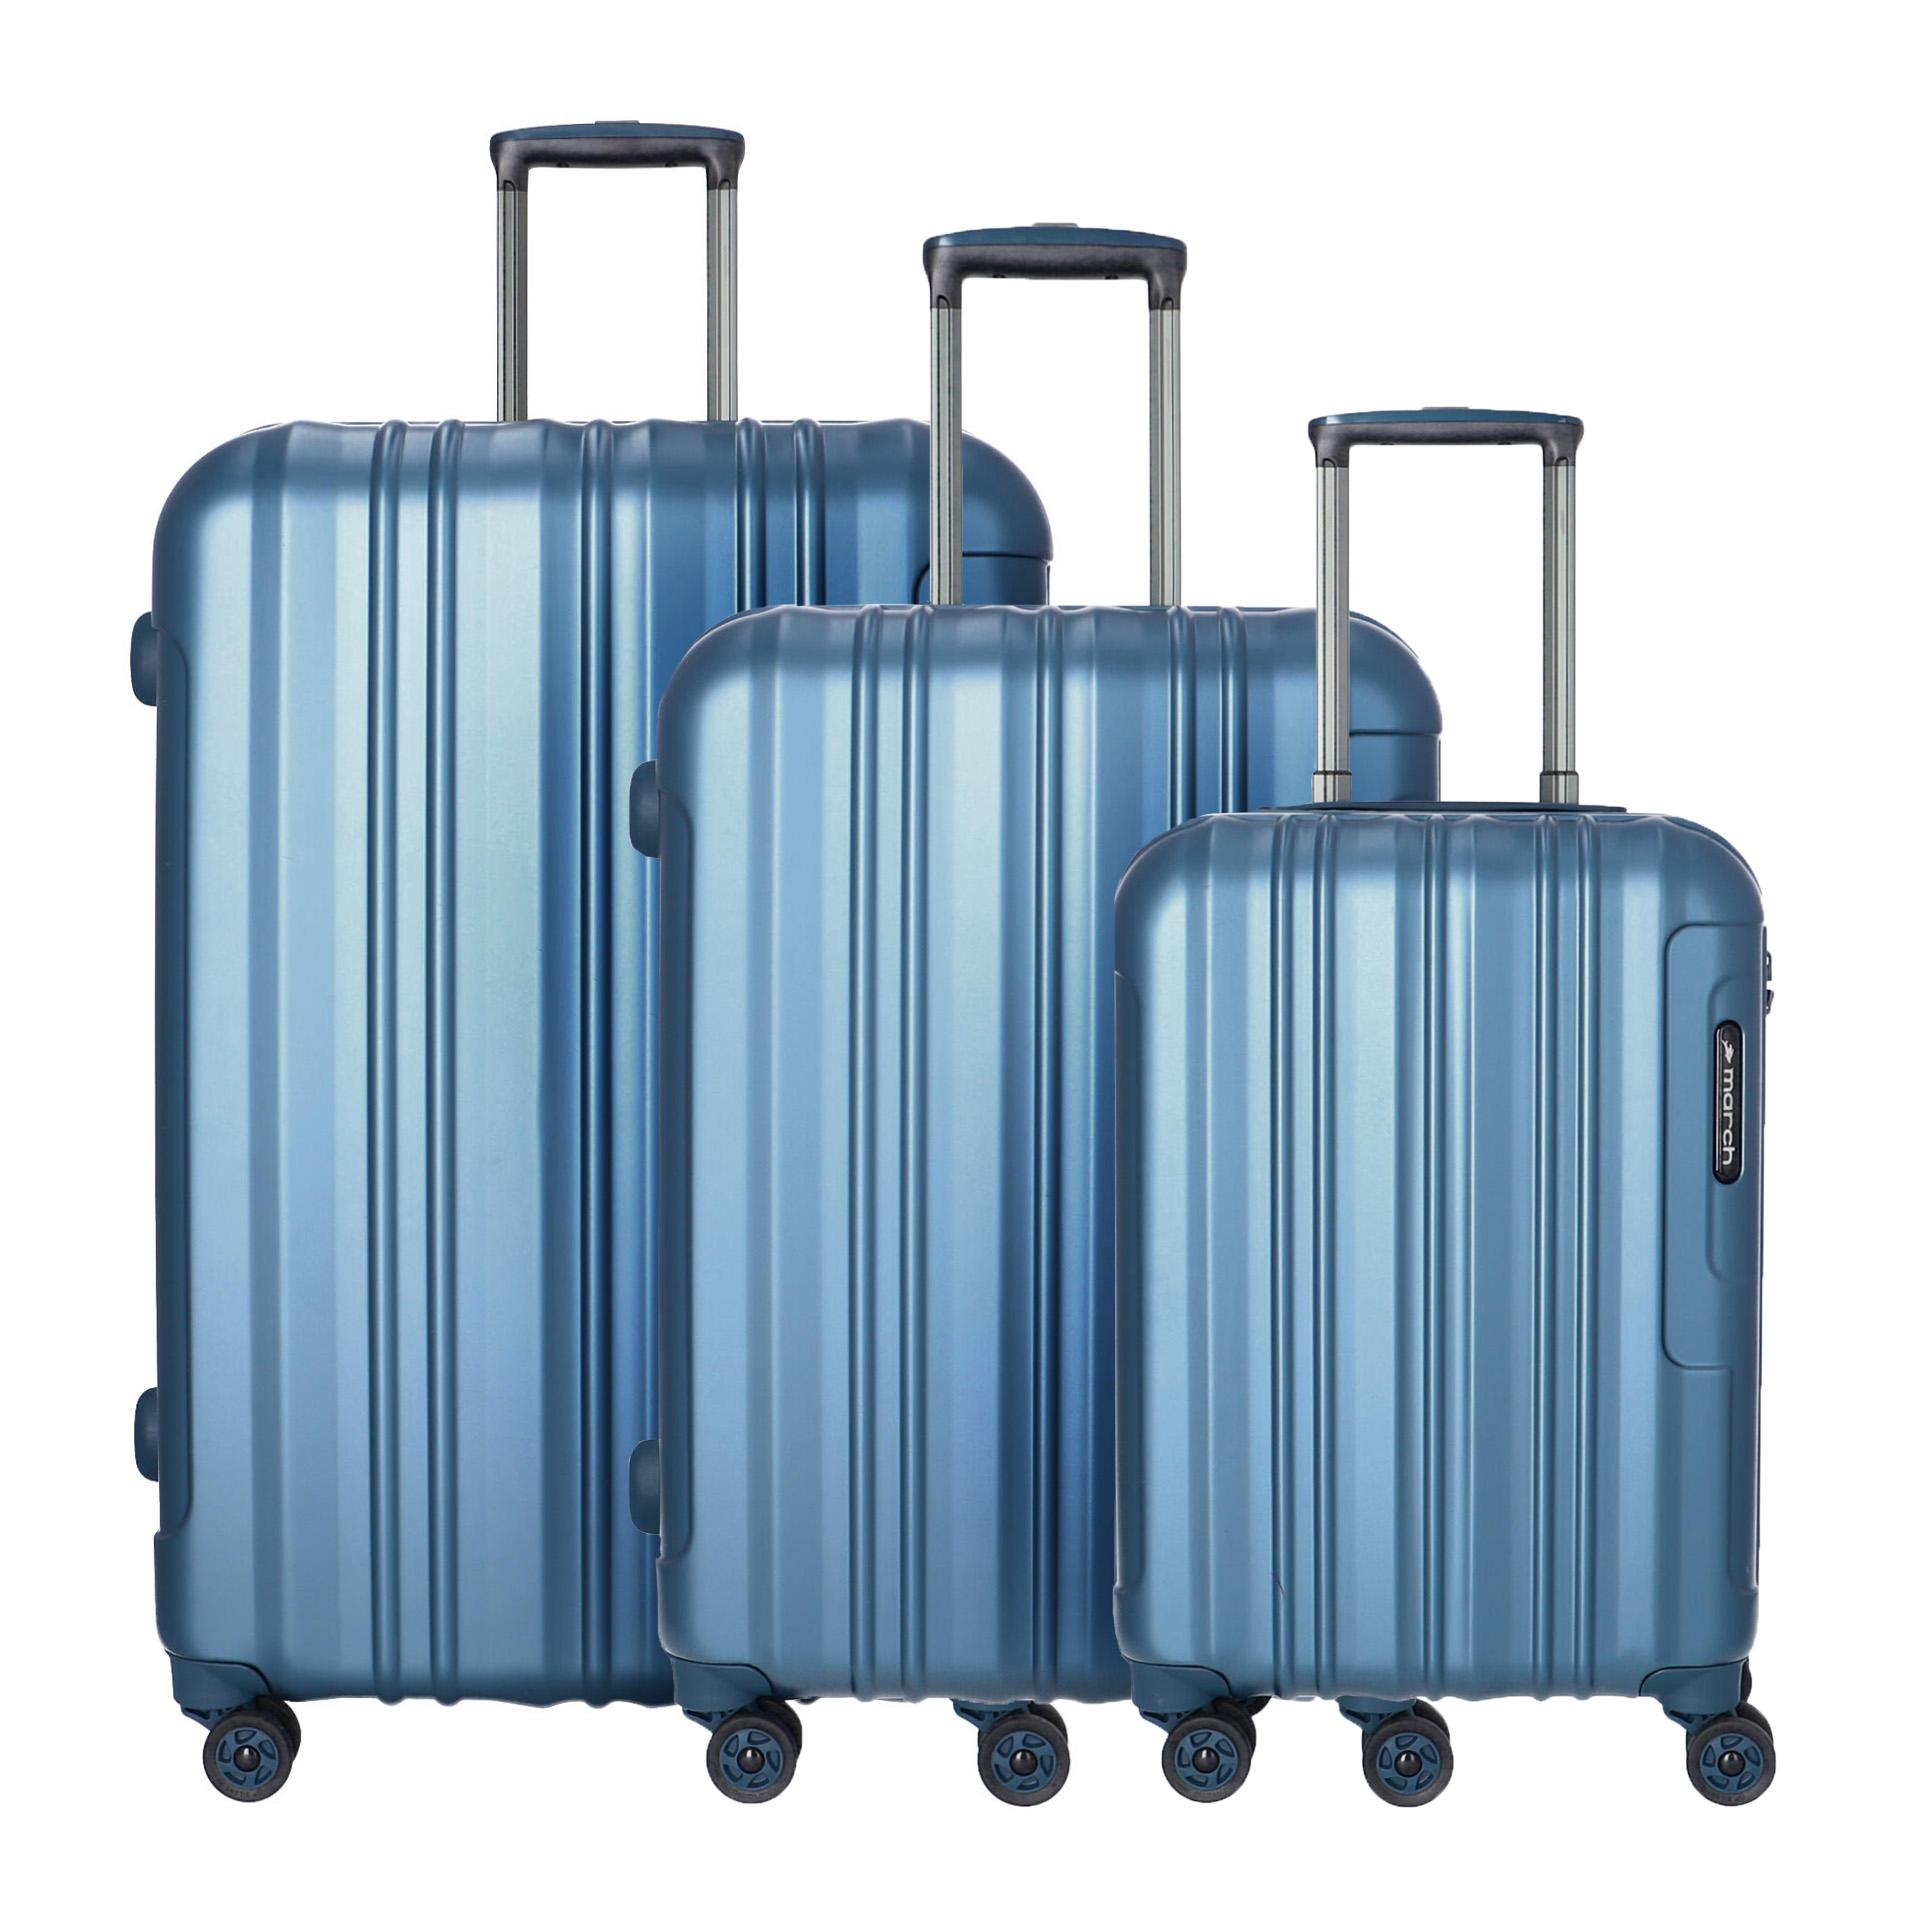 Cosmopolitan SE 3 teiliges Kofferset S/M/L metal blue